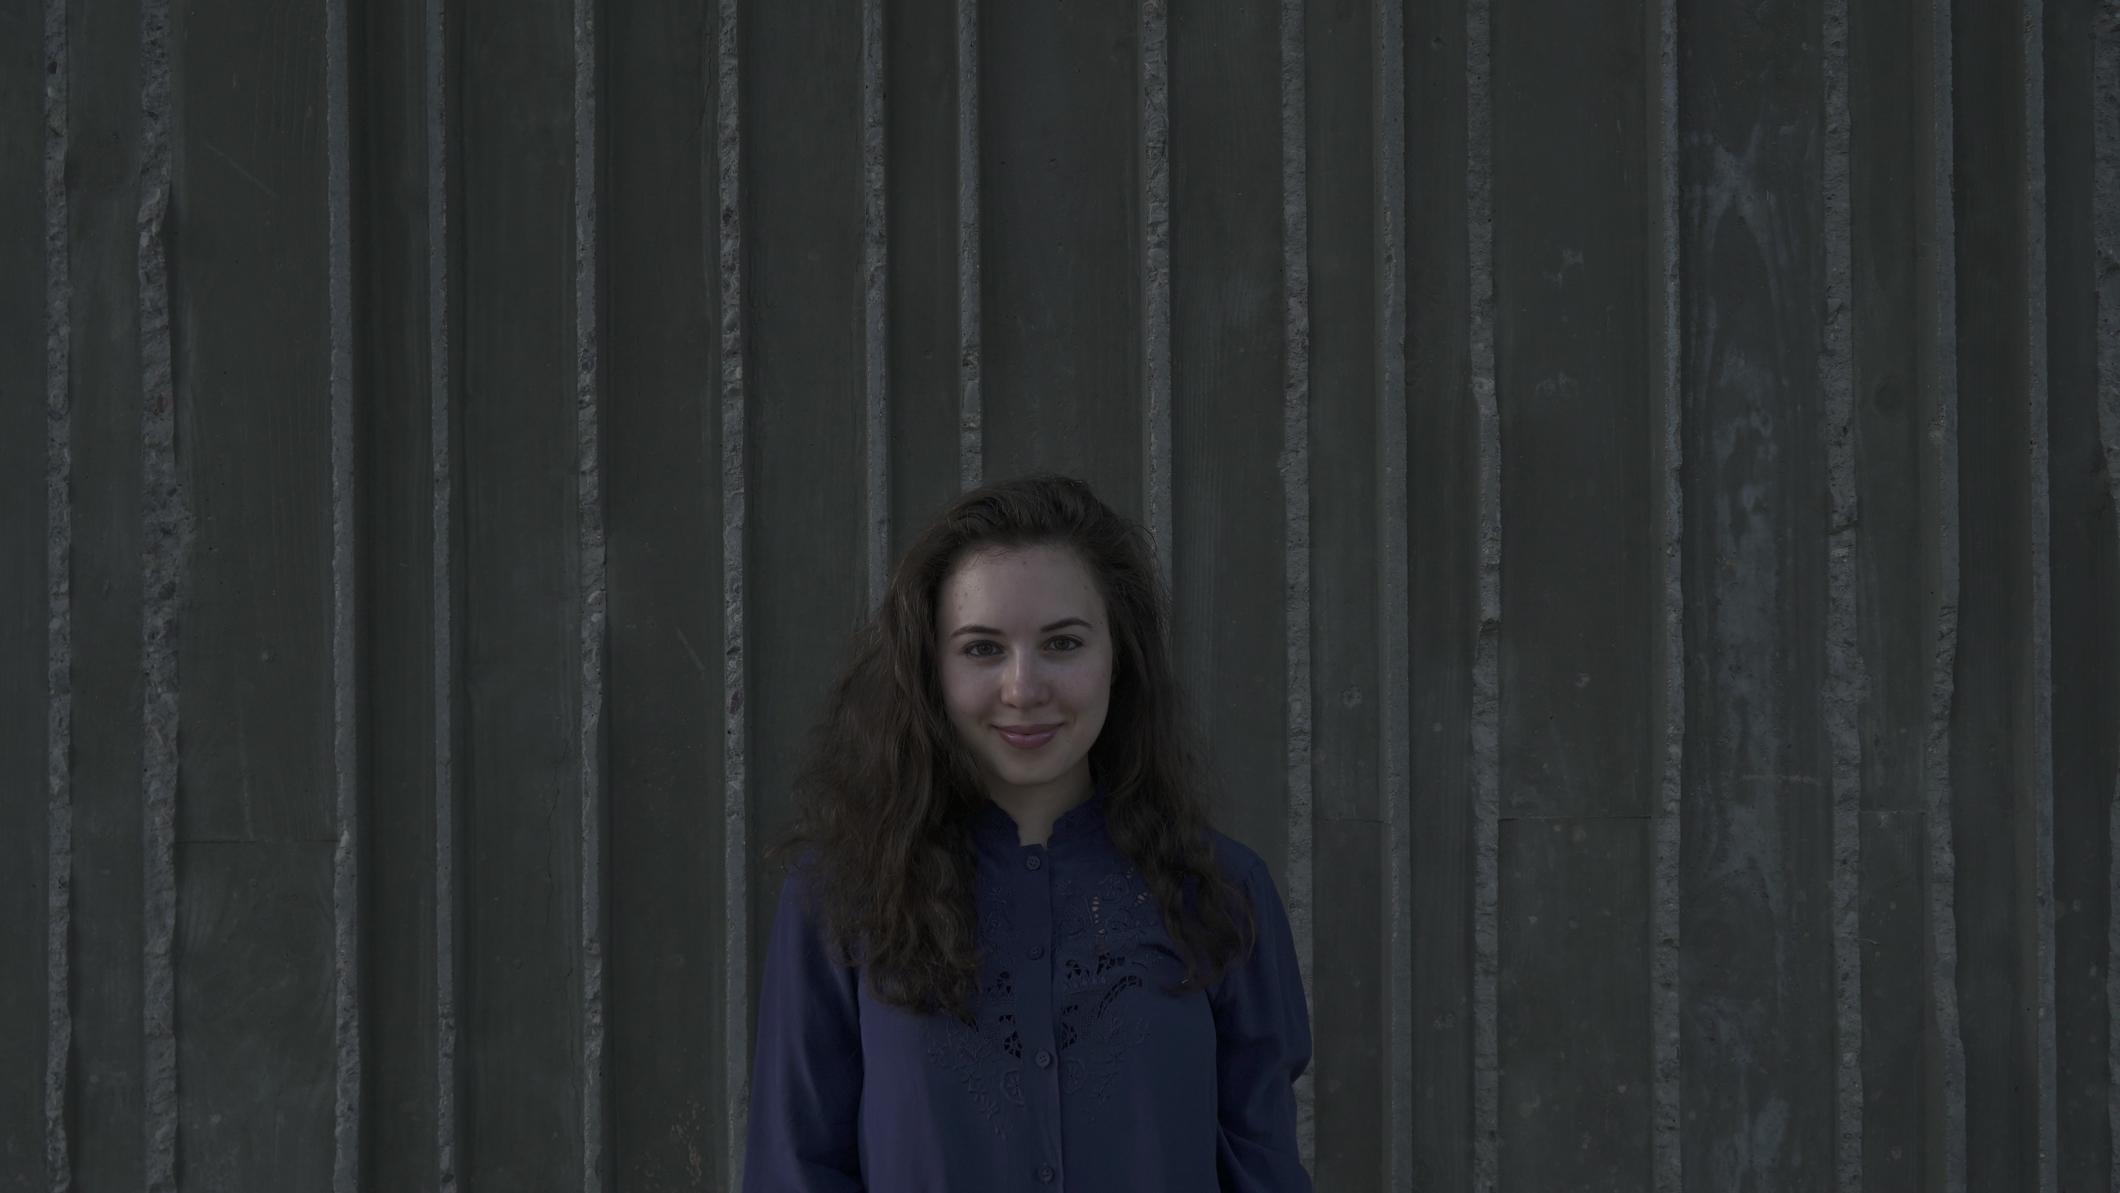 Portrait of Pauline Shongov